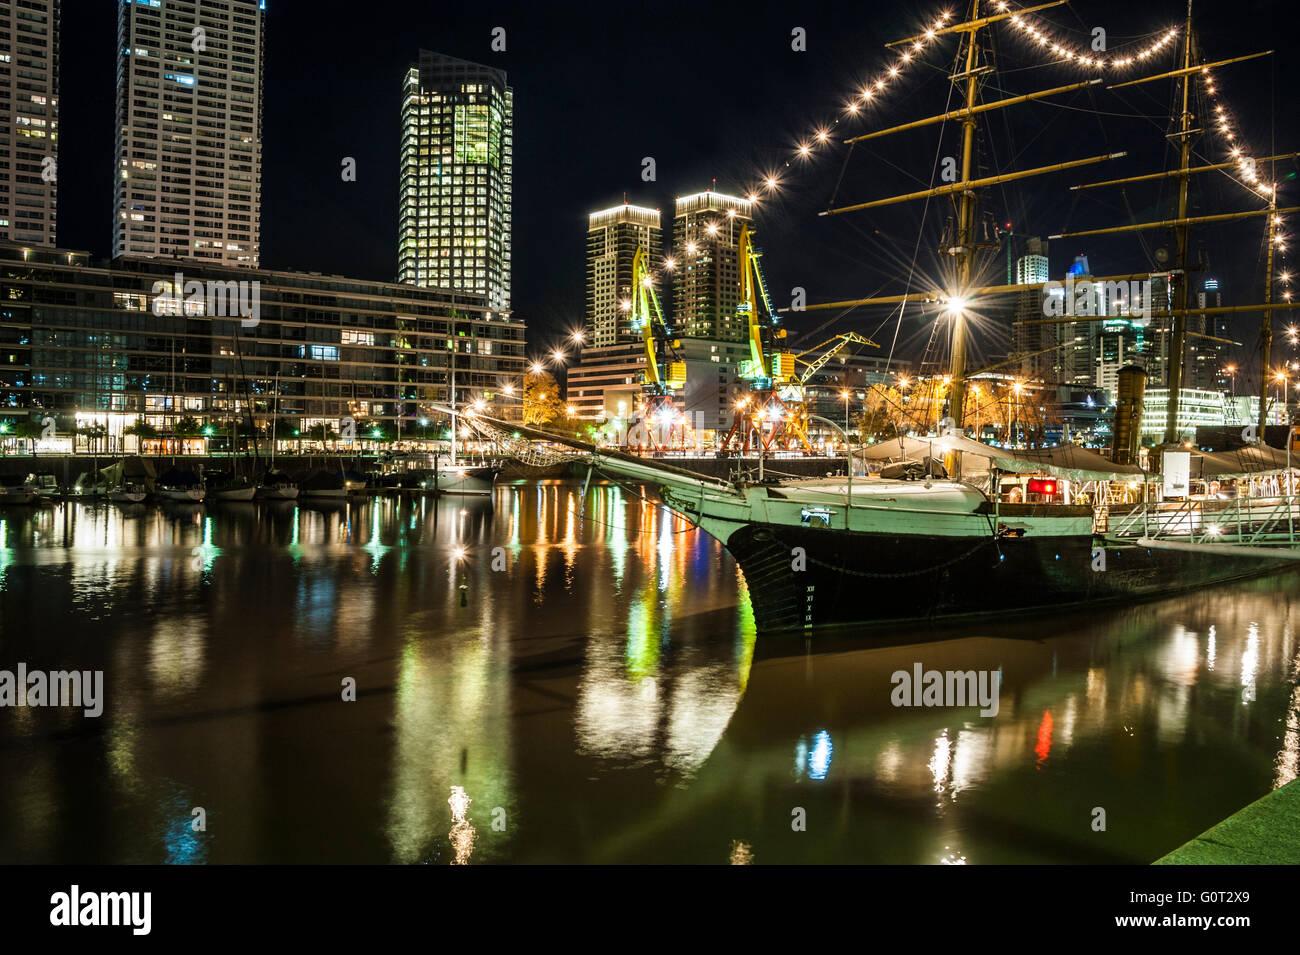 La nuit à Puerto Madero, Buenos Aires, Argentine Photo Stock